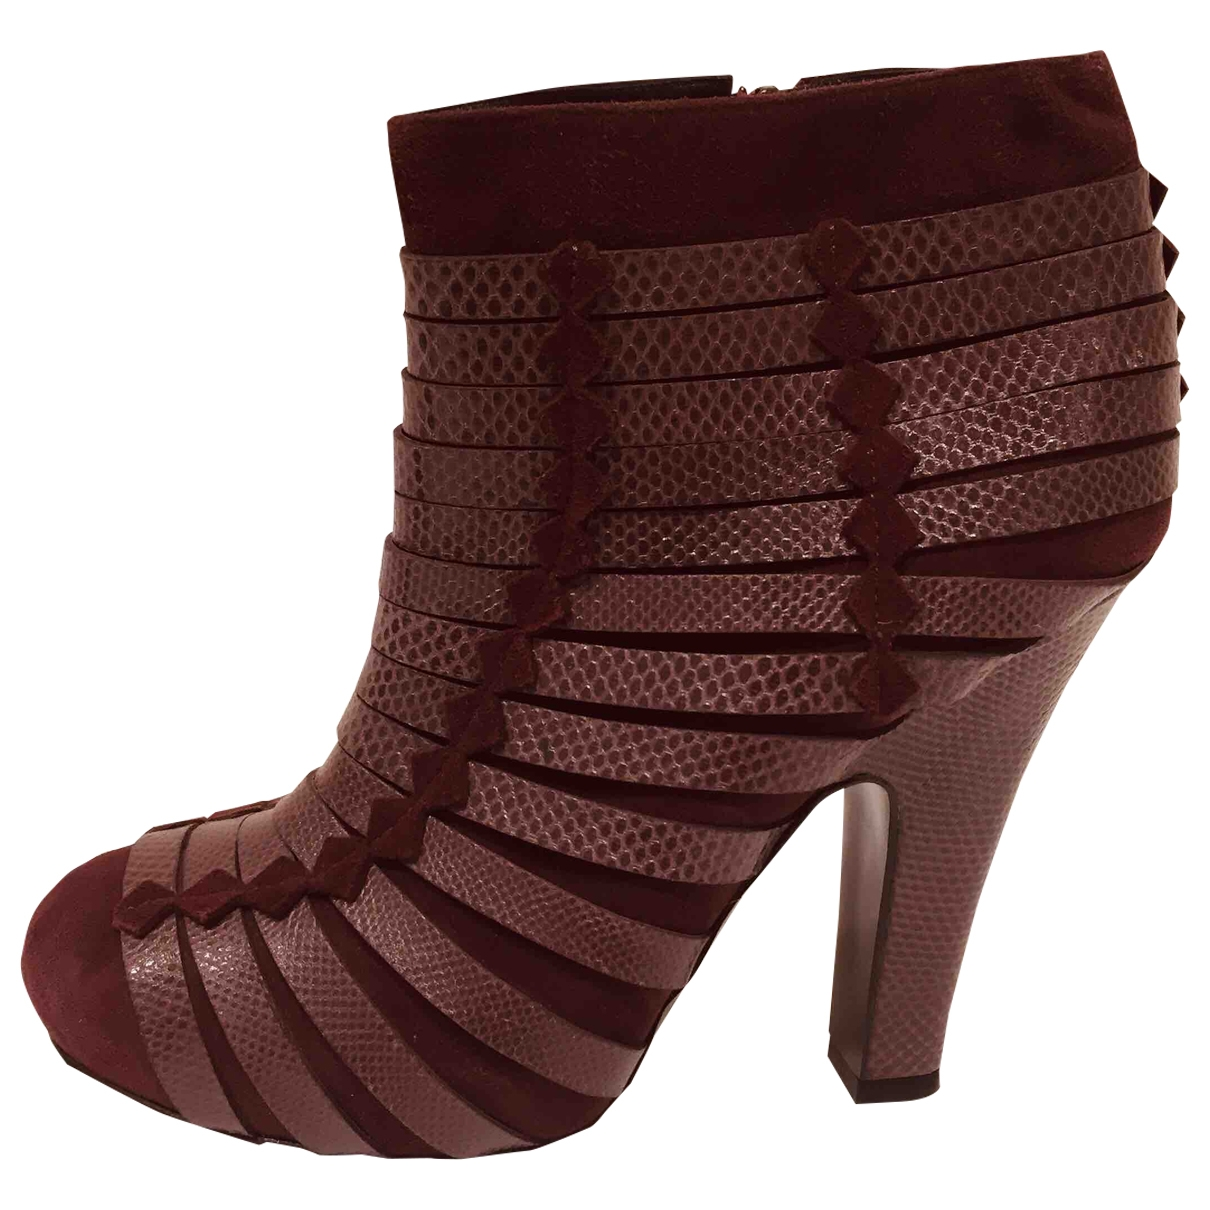 Bottega Veneta - Boots   pour femme en velours